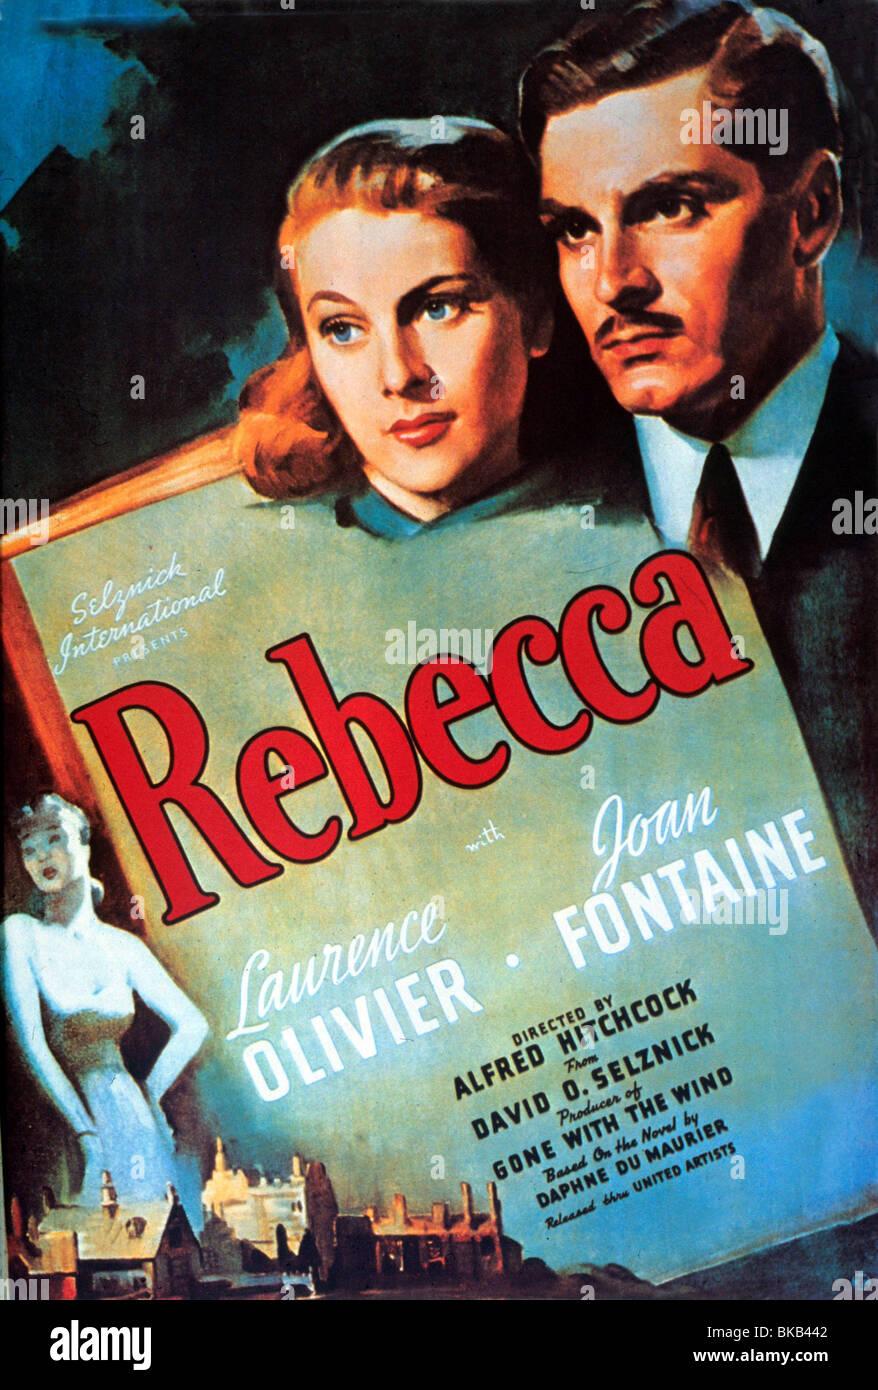 REBECCA -1940 POSTER - Stock Image